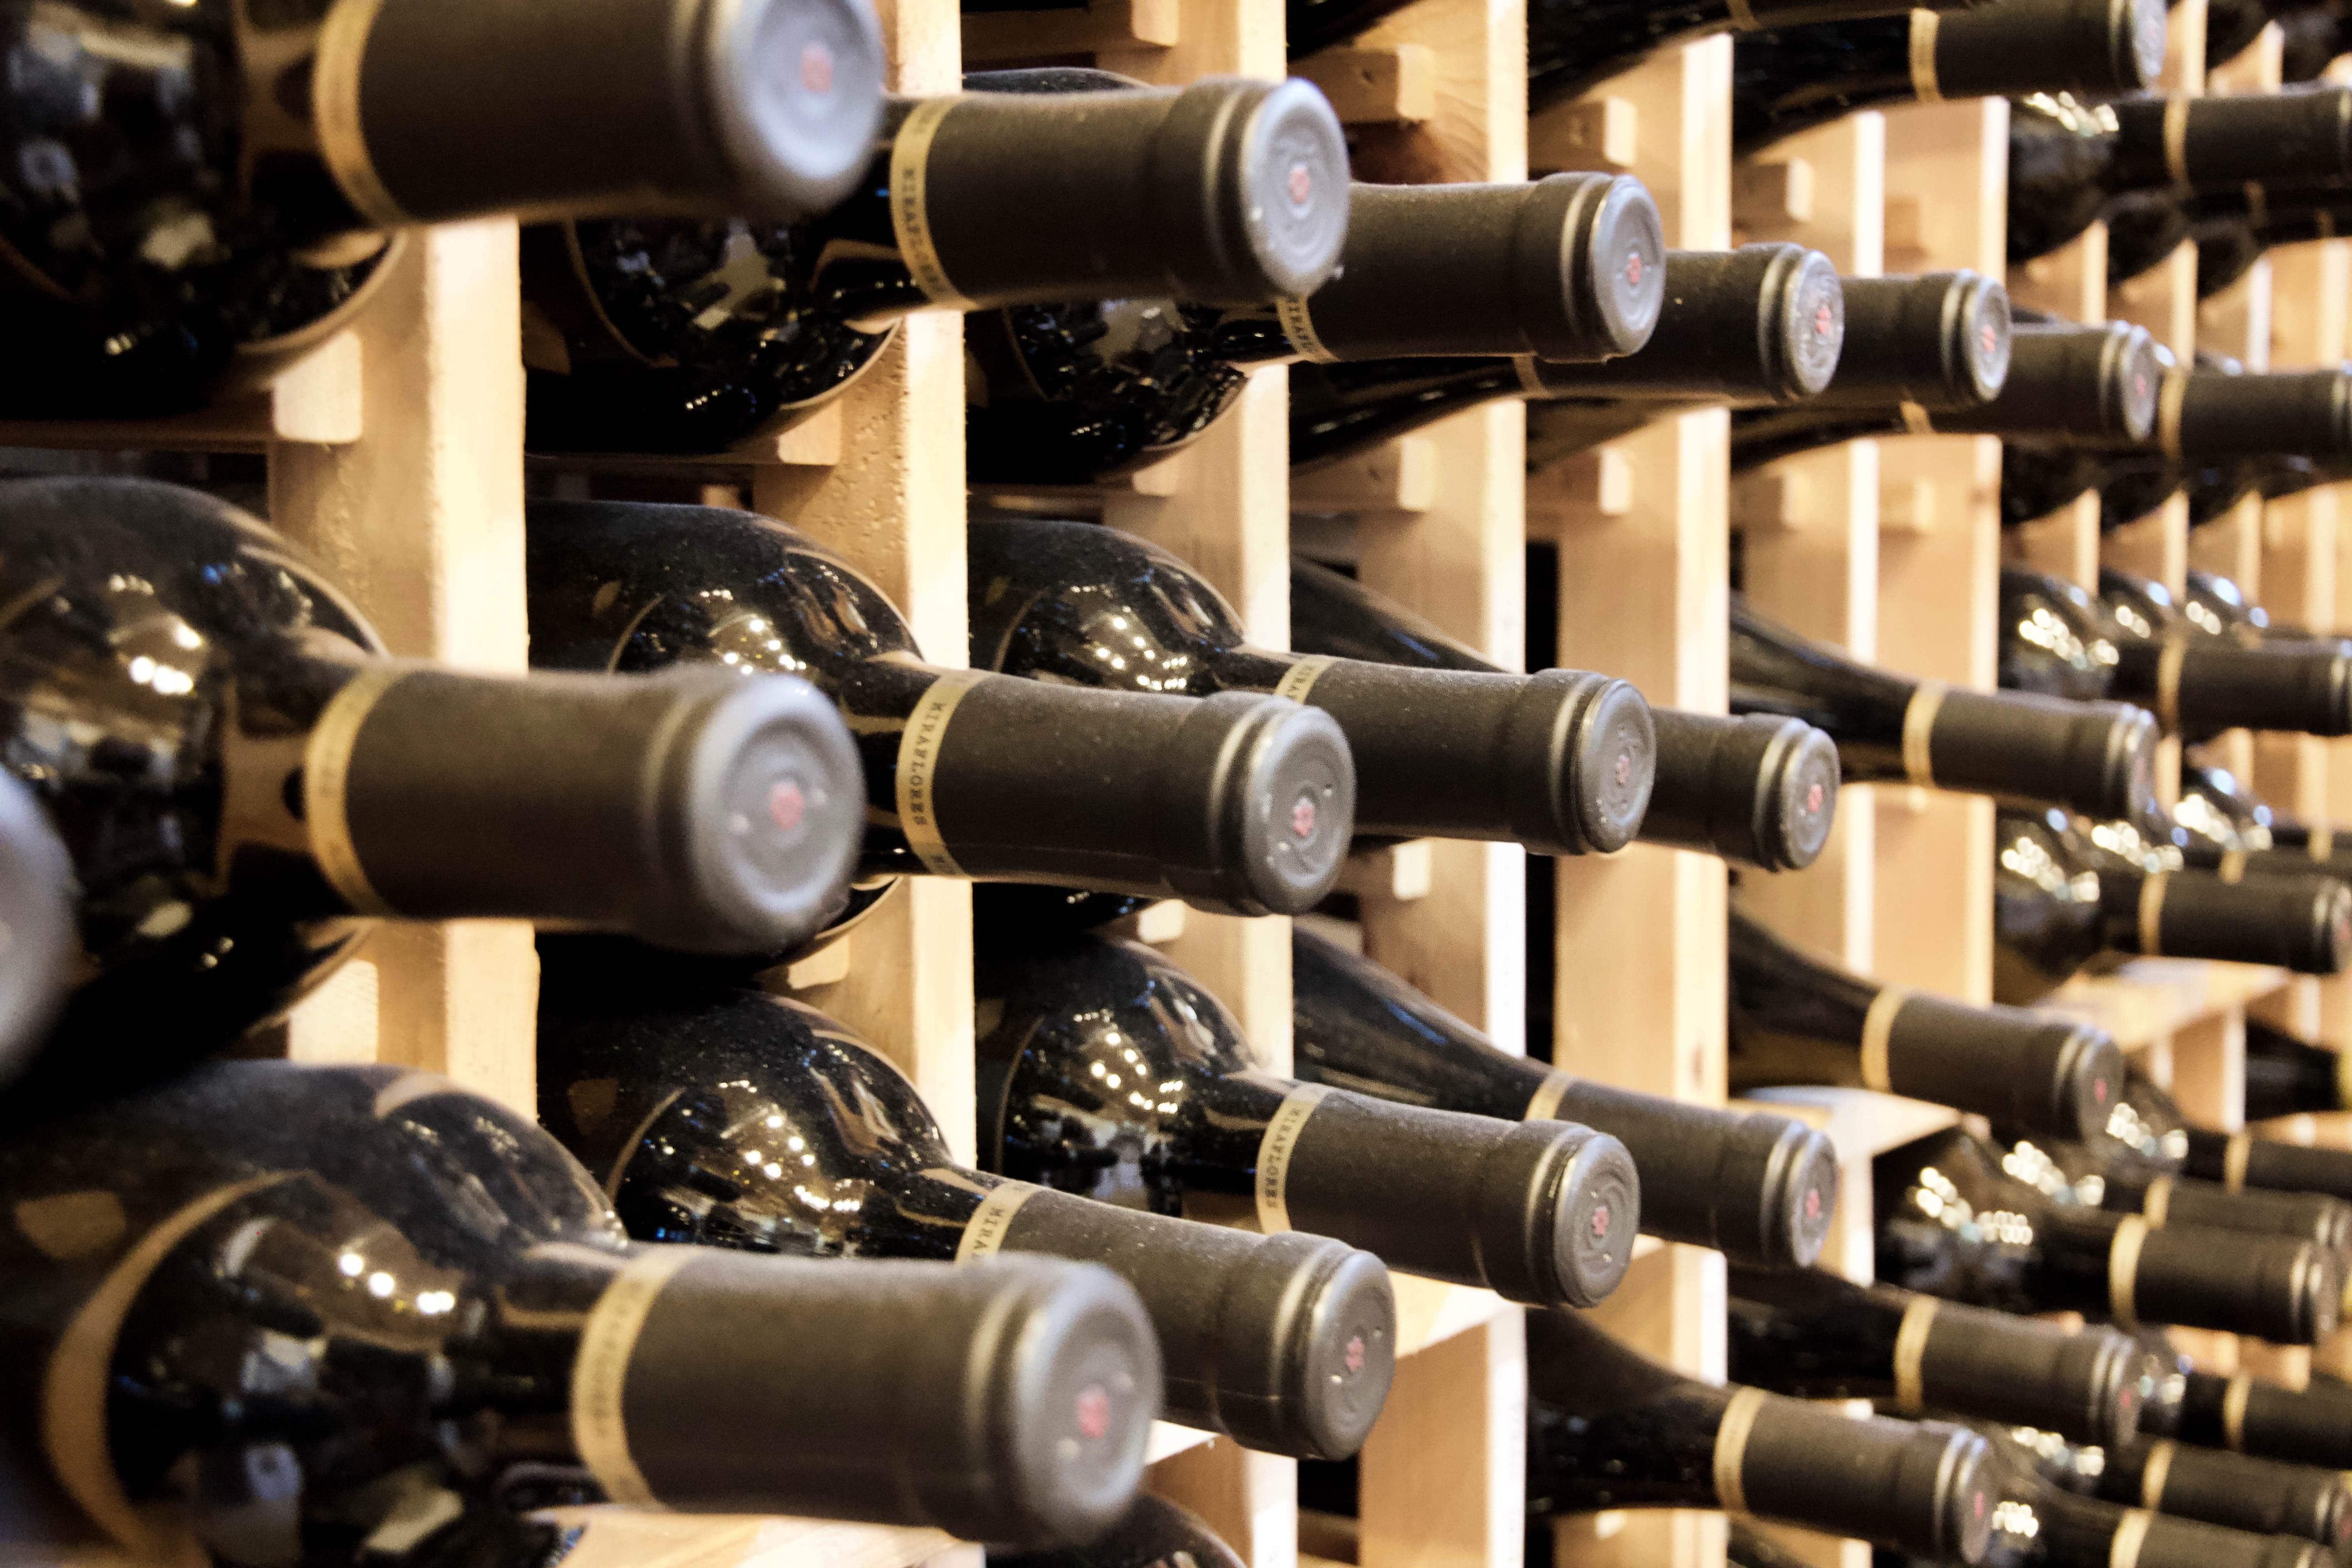 Library wine miraflores